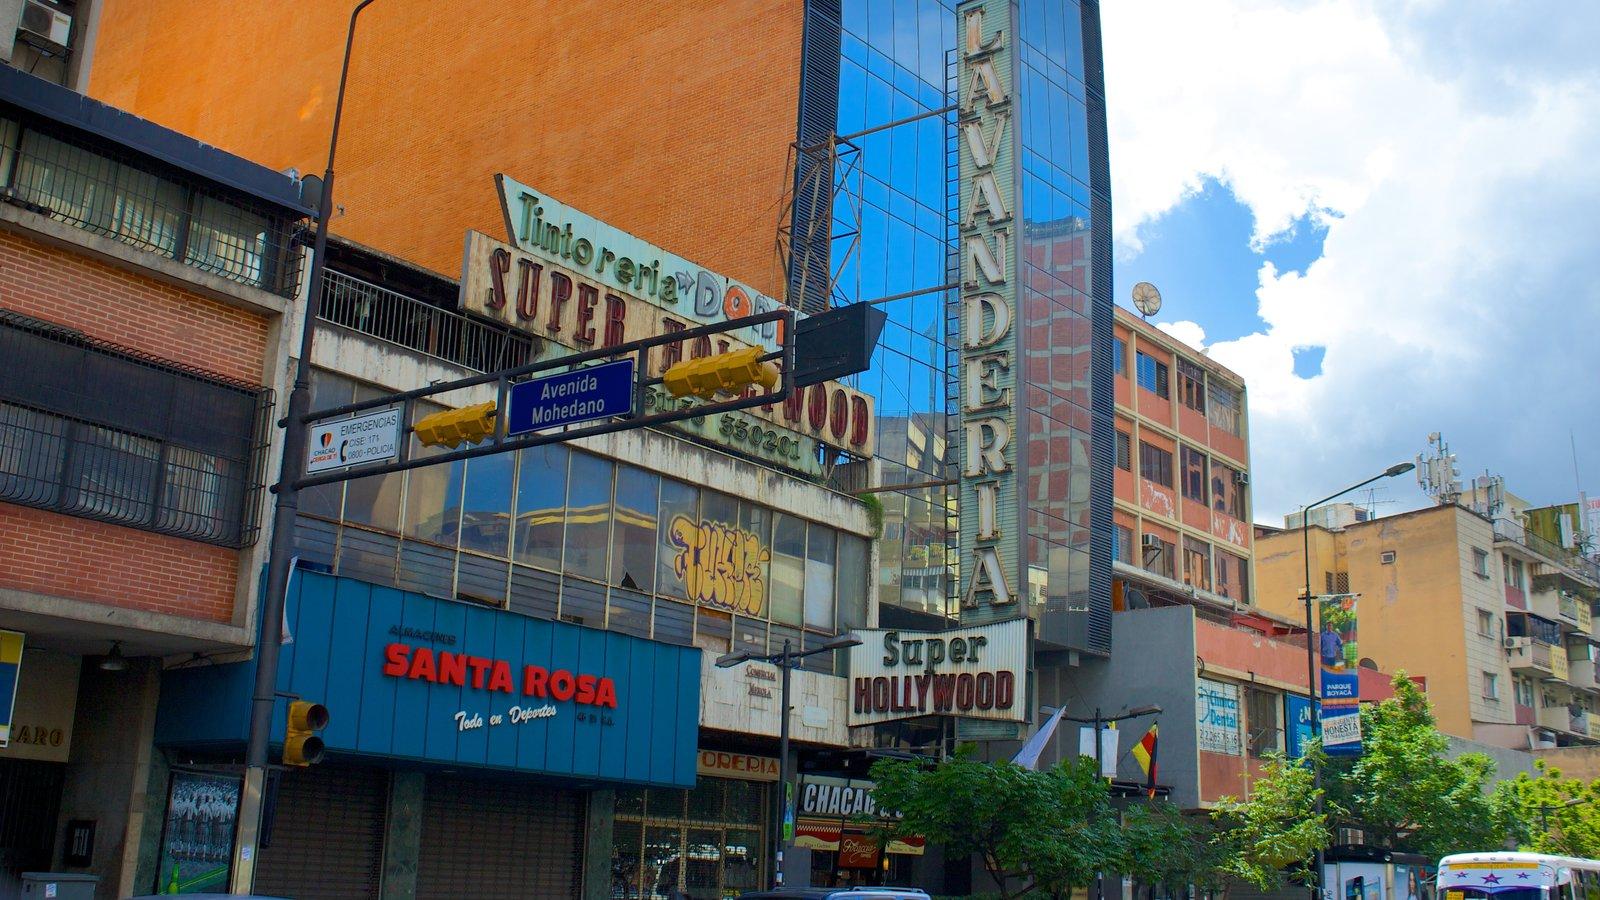 Caracas caracterizando uma cidade